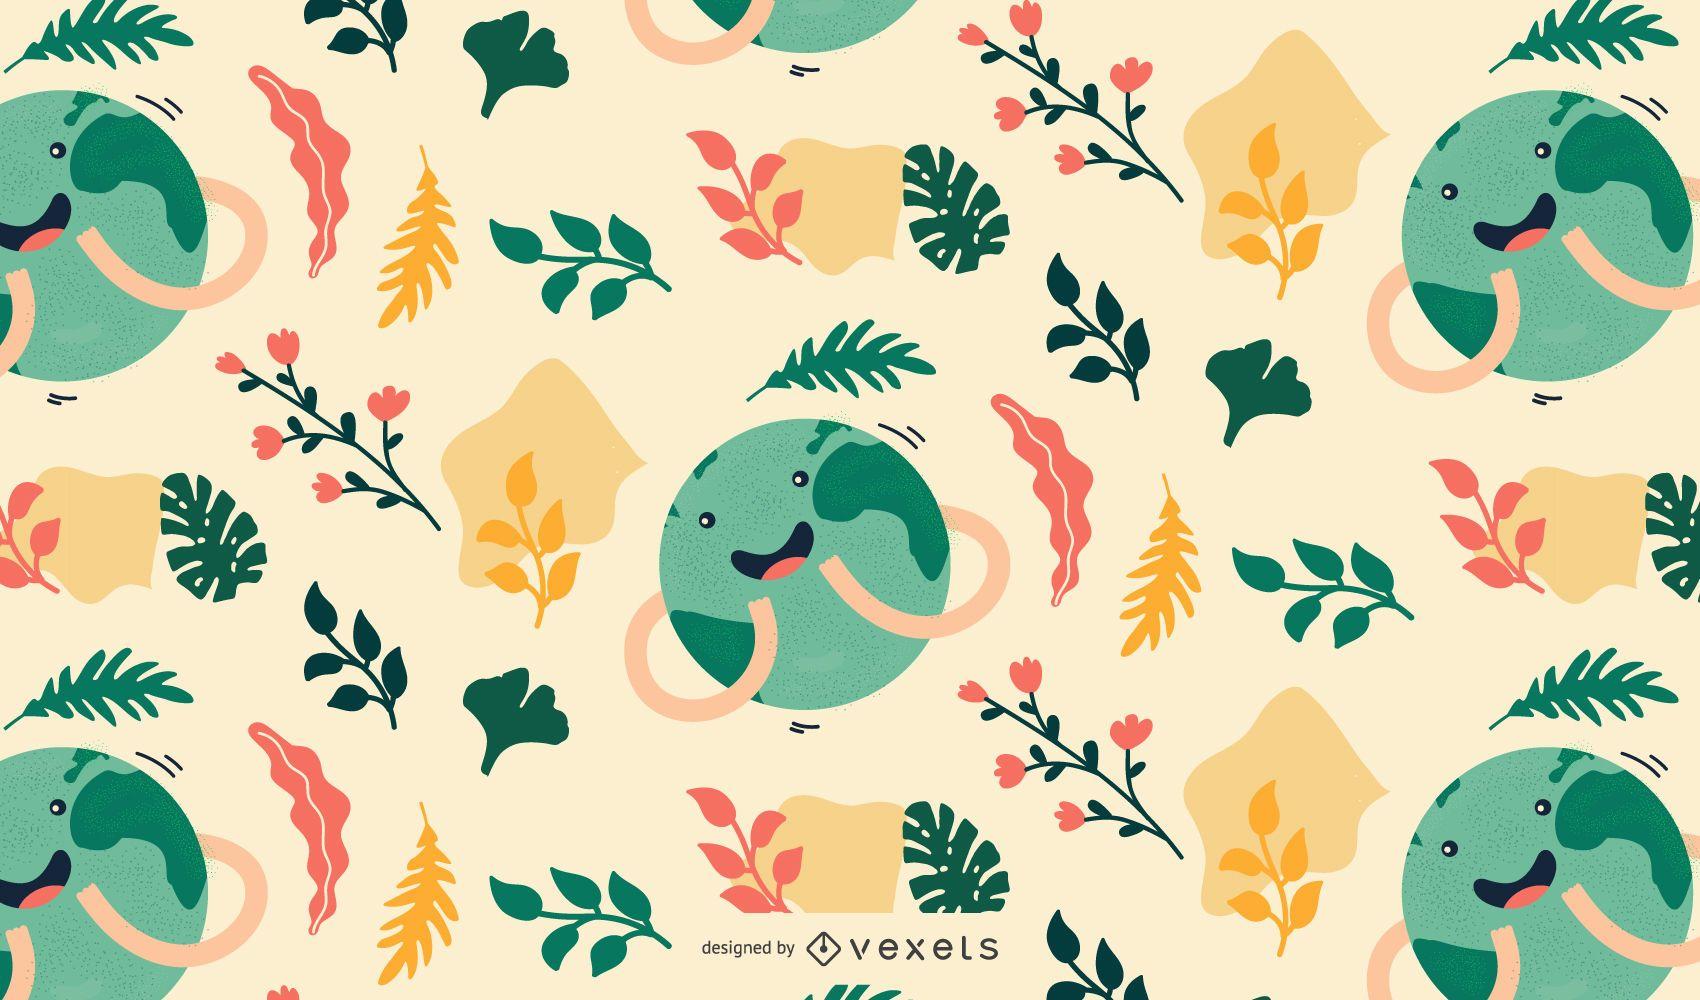 Cute earth day pattern design